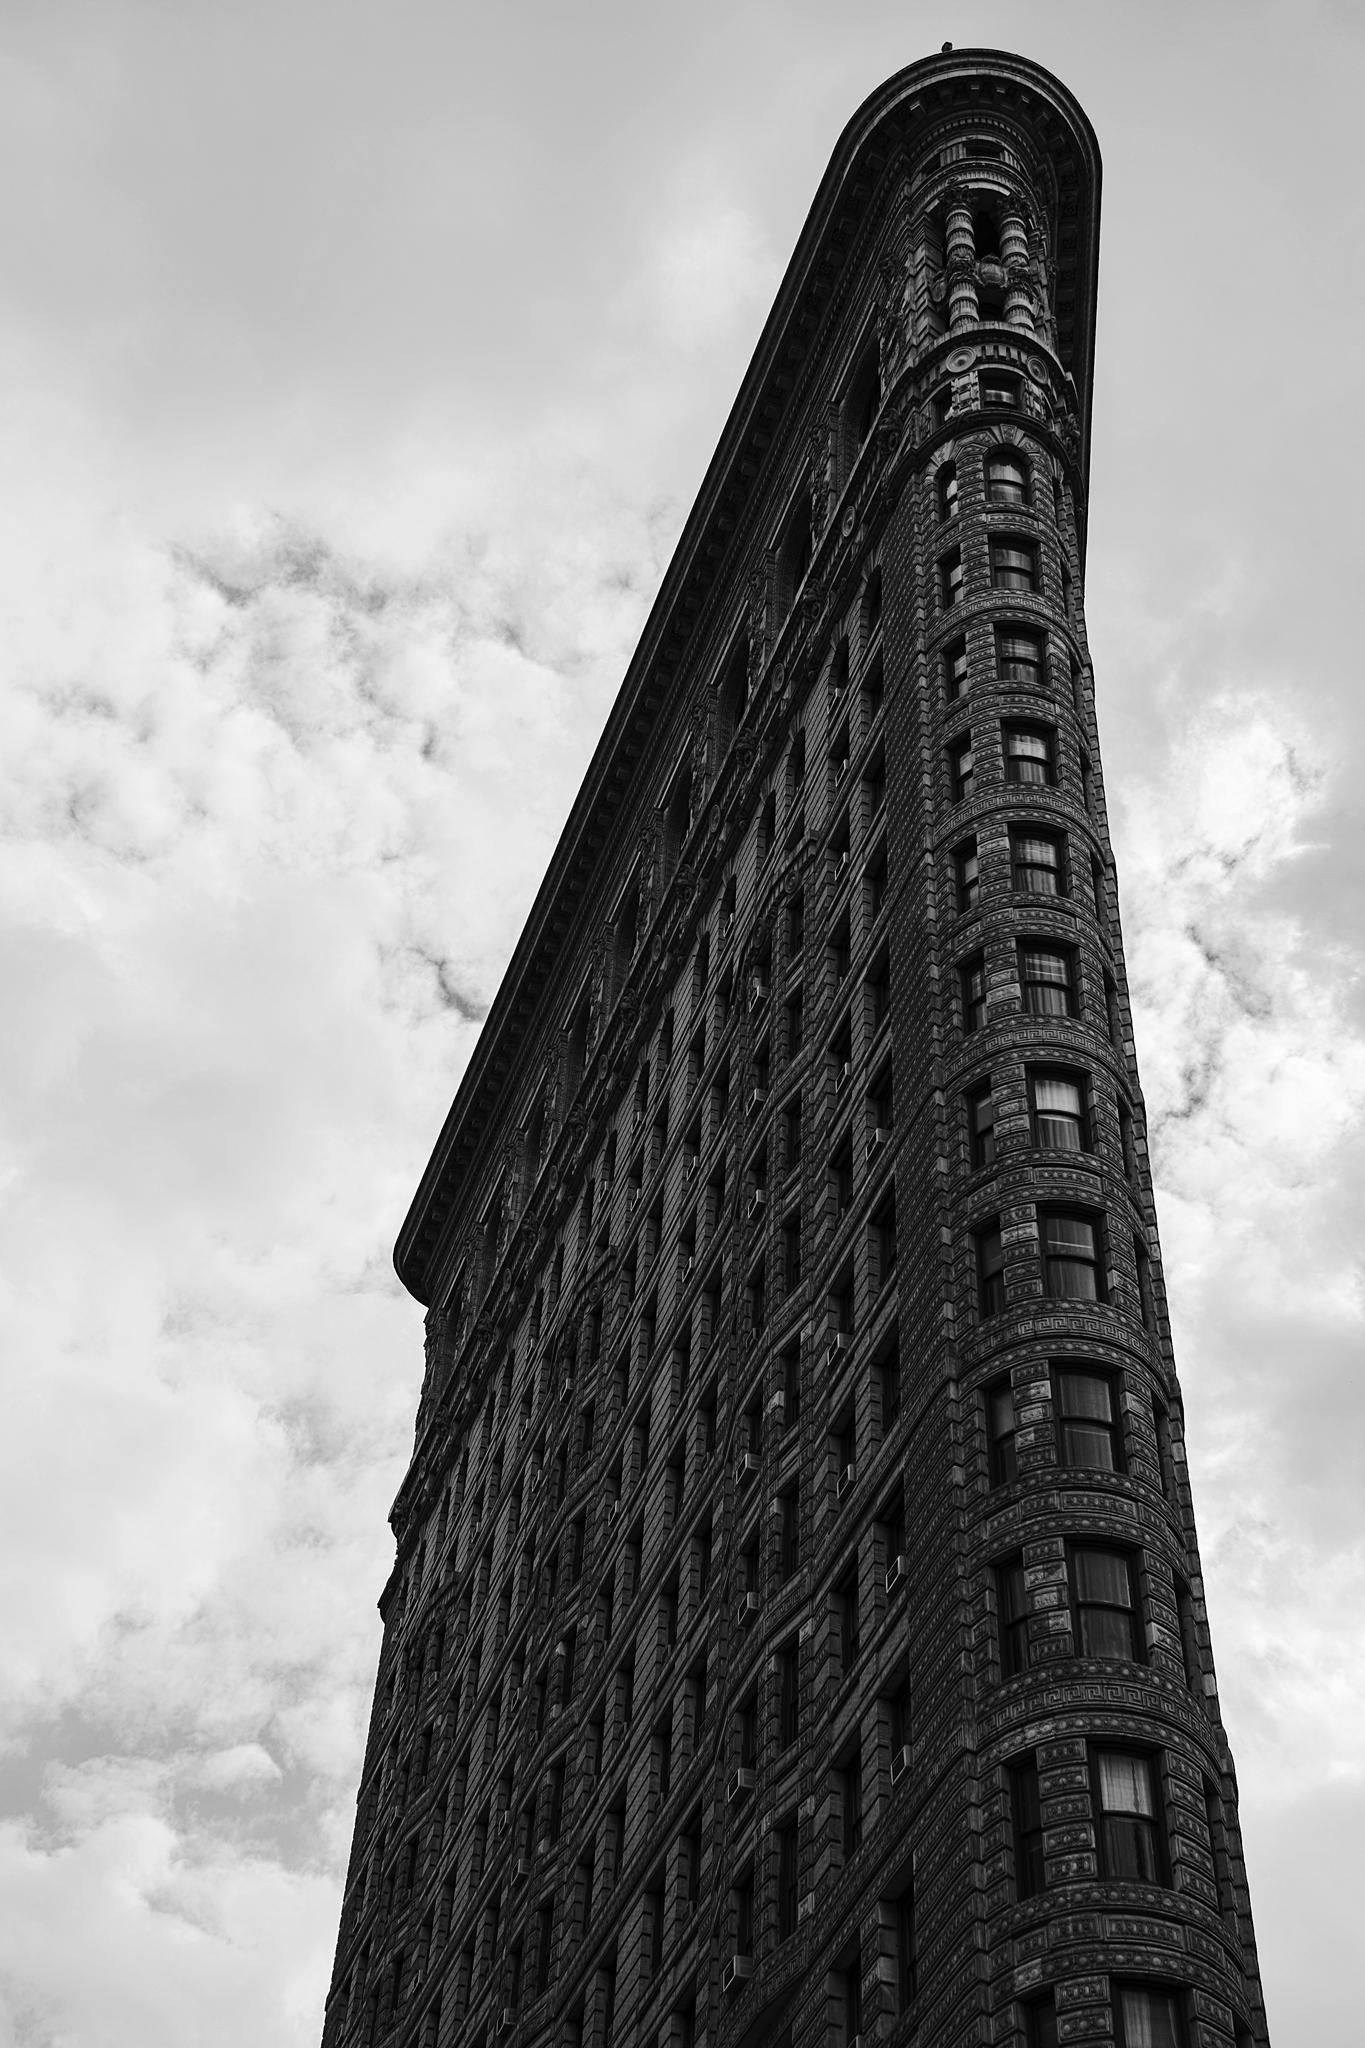 Flatiron Building, July 2014.